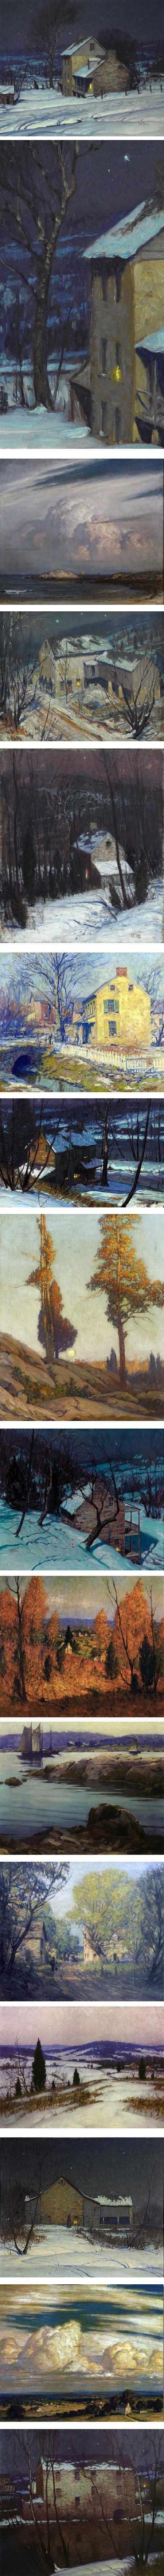 George Sotter, Pennsylvania Impressionist